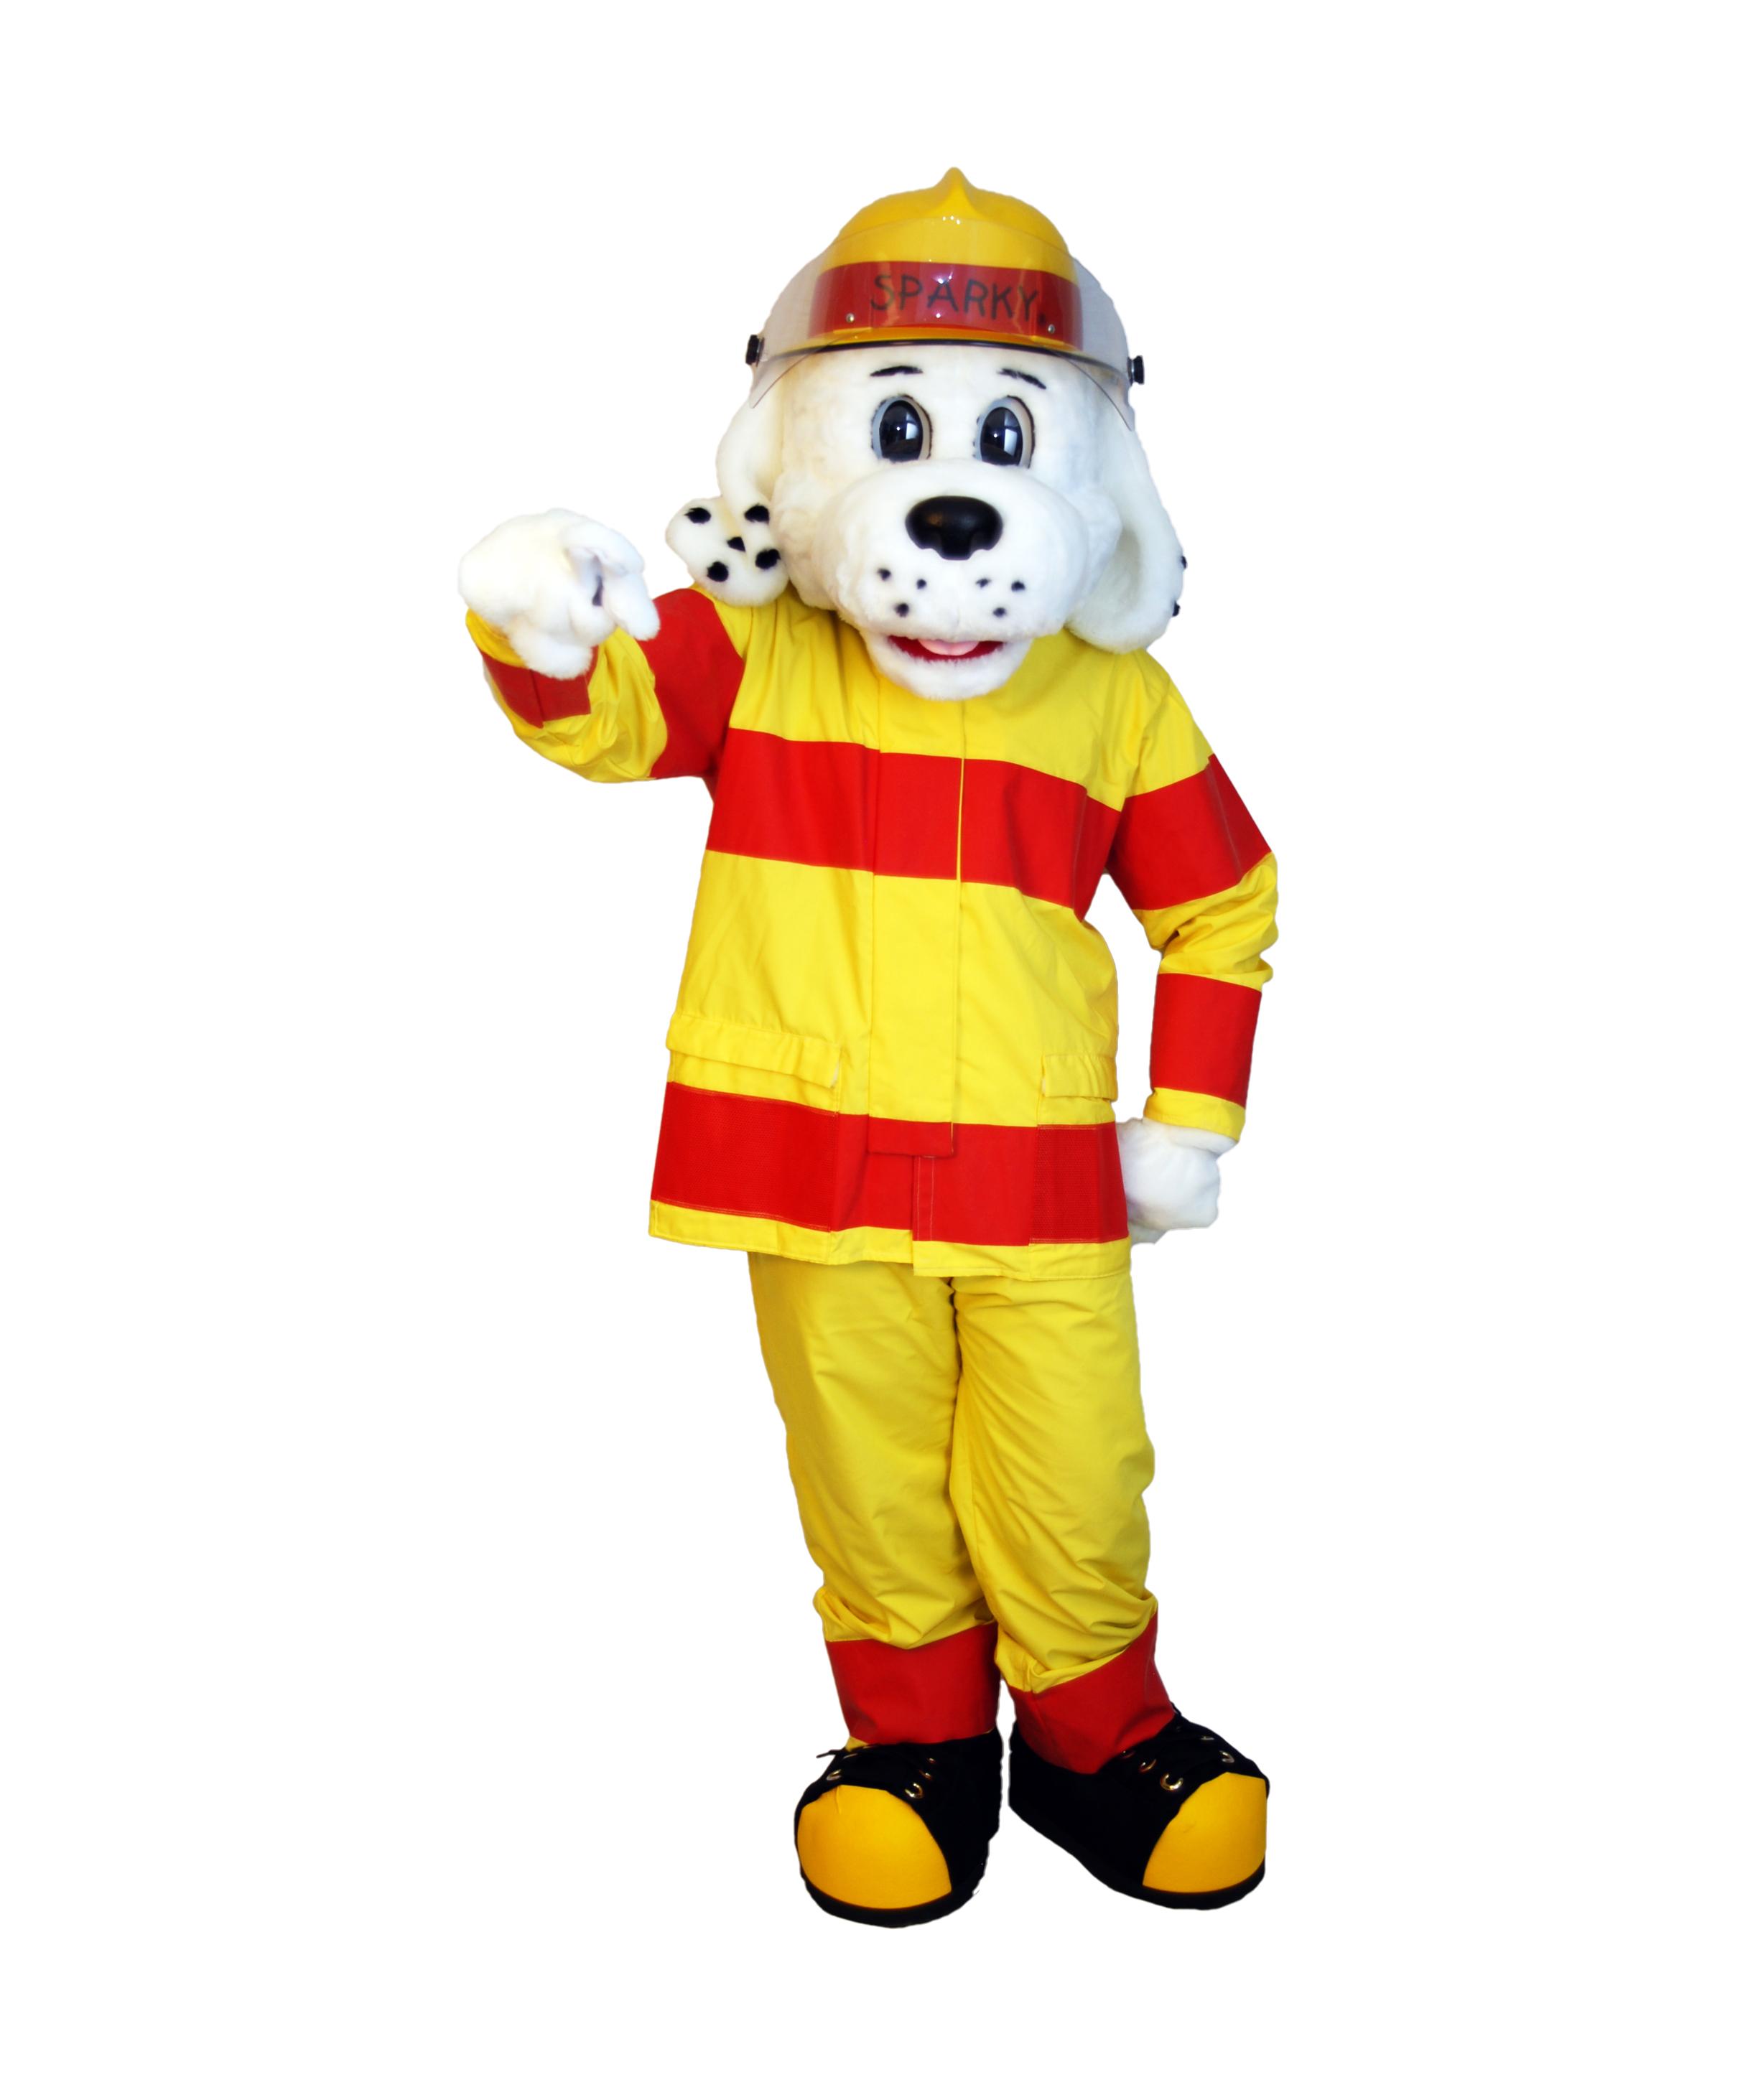 Dalmatian Fire Dog Costume